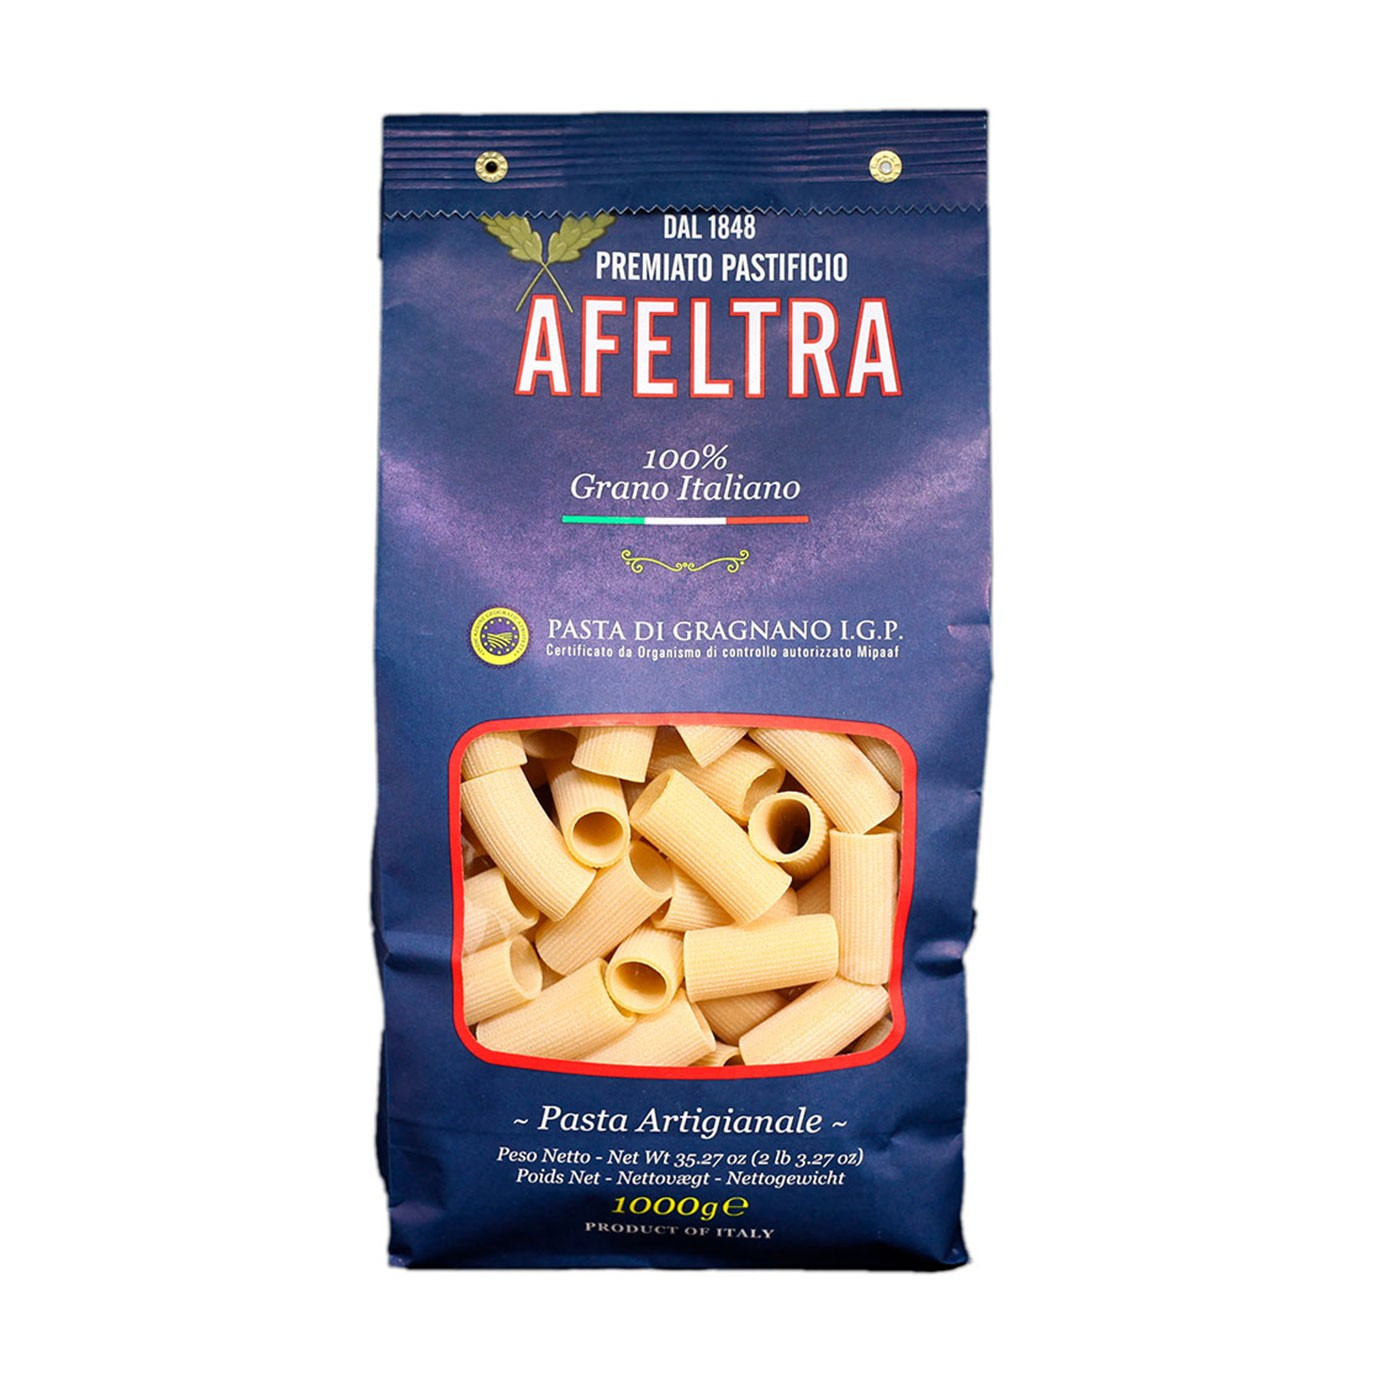 100% Italian Grain Rigatoni 35.3 oz - Afeltra